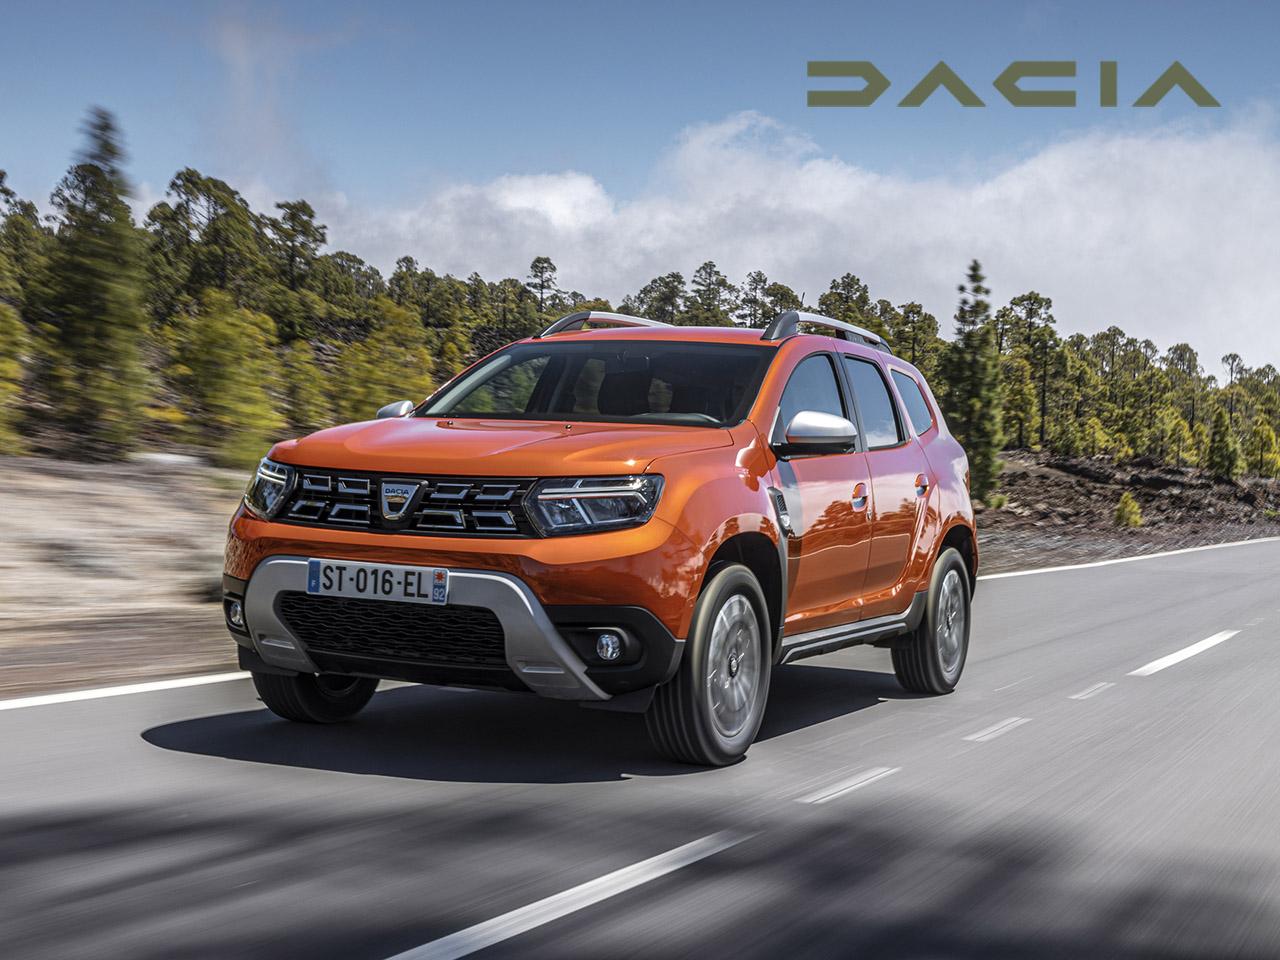 Uusi Dacia Duster